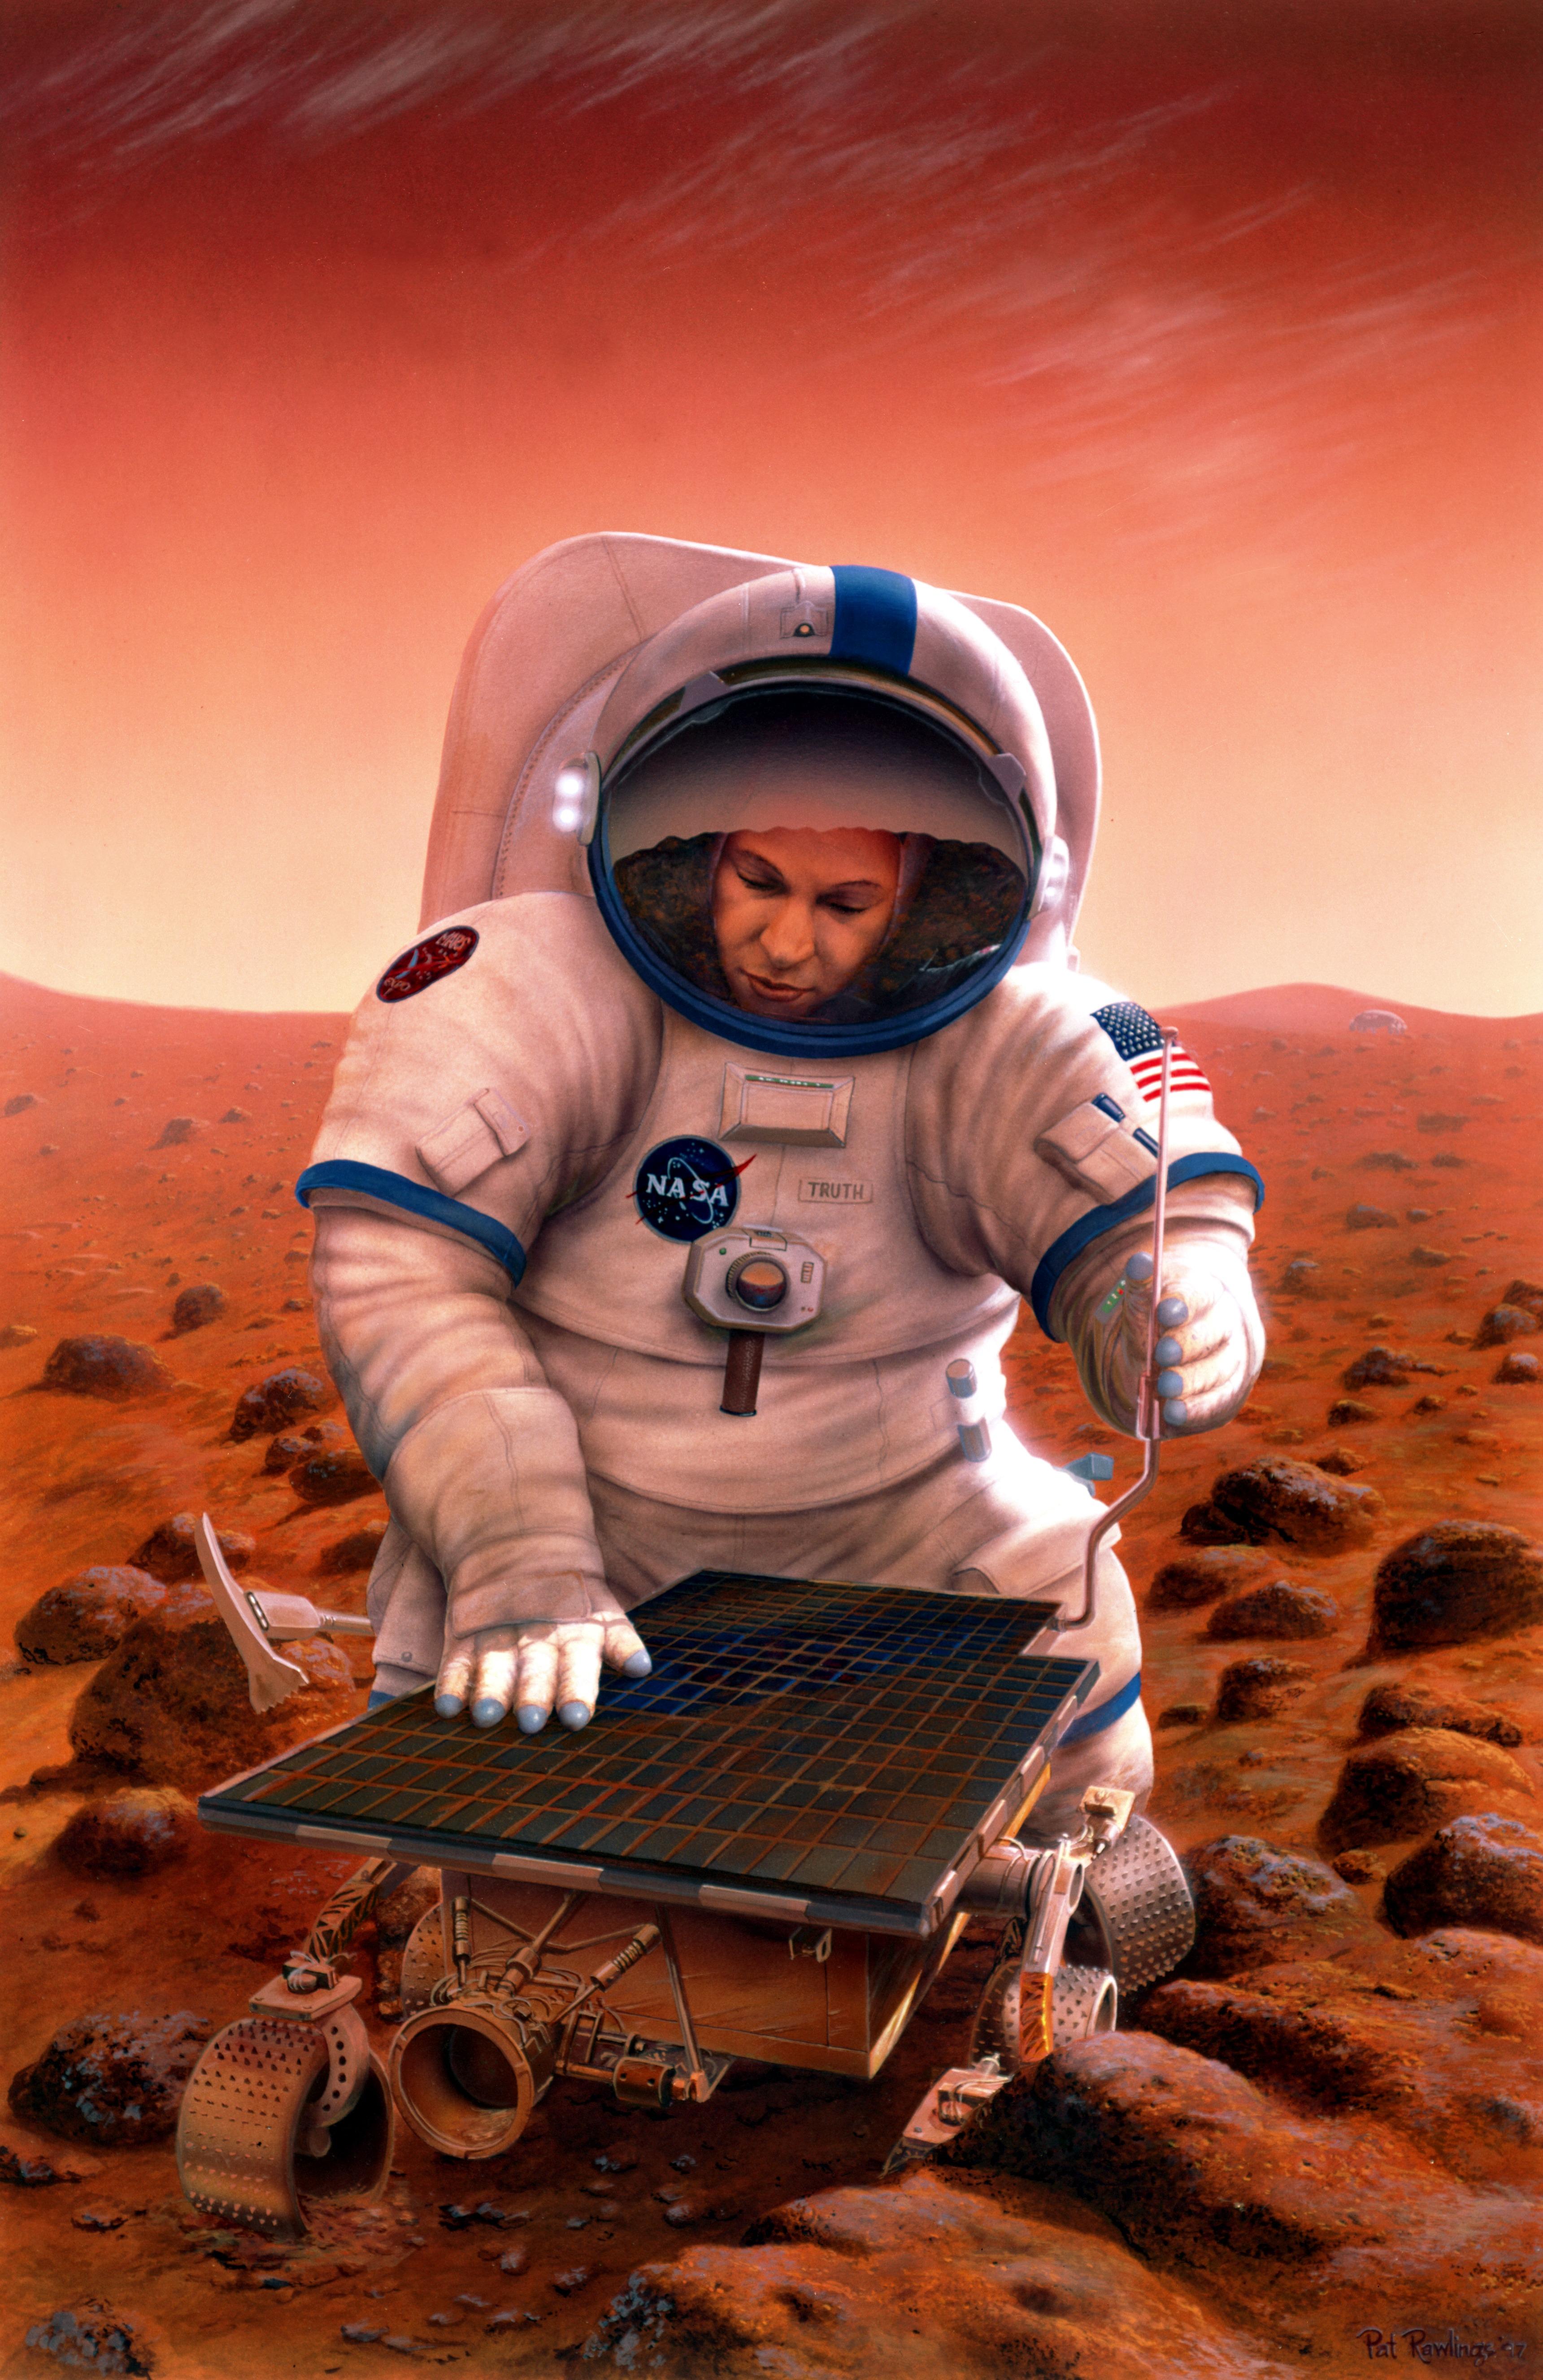 Mars Pathfinder Nasa | Tattoo Design Bild